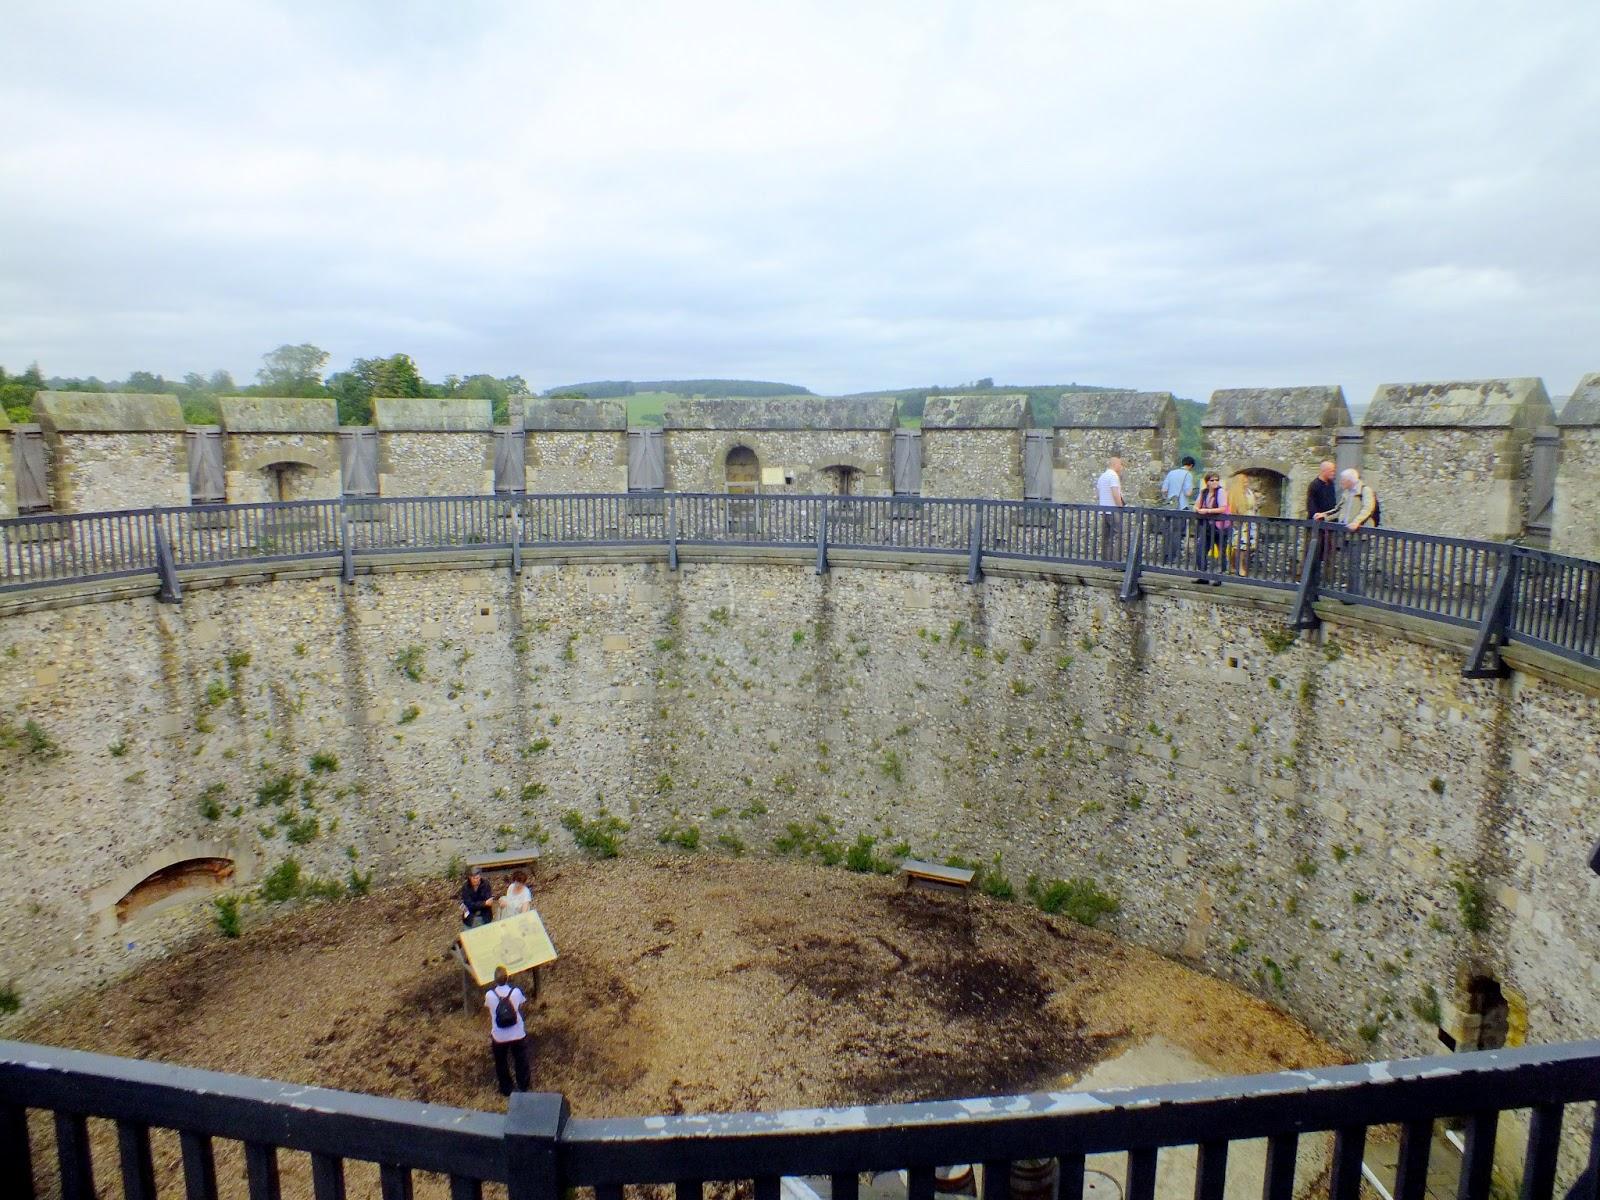 cytadela, wieża obronna